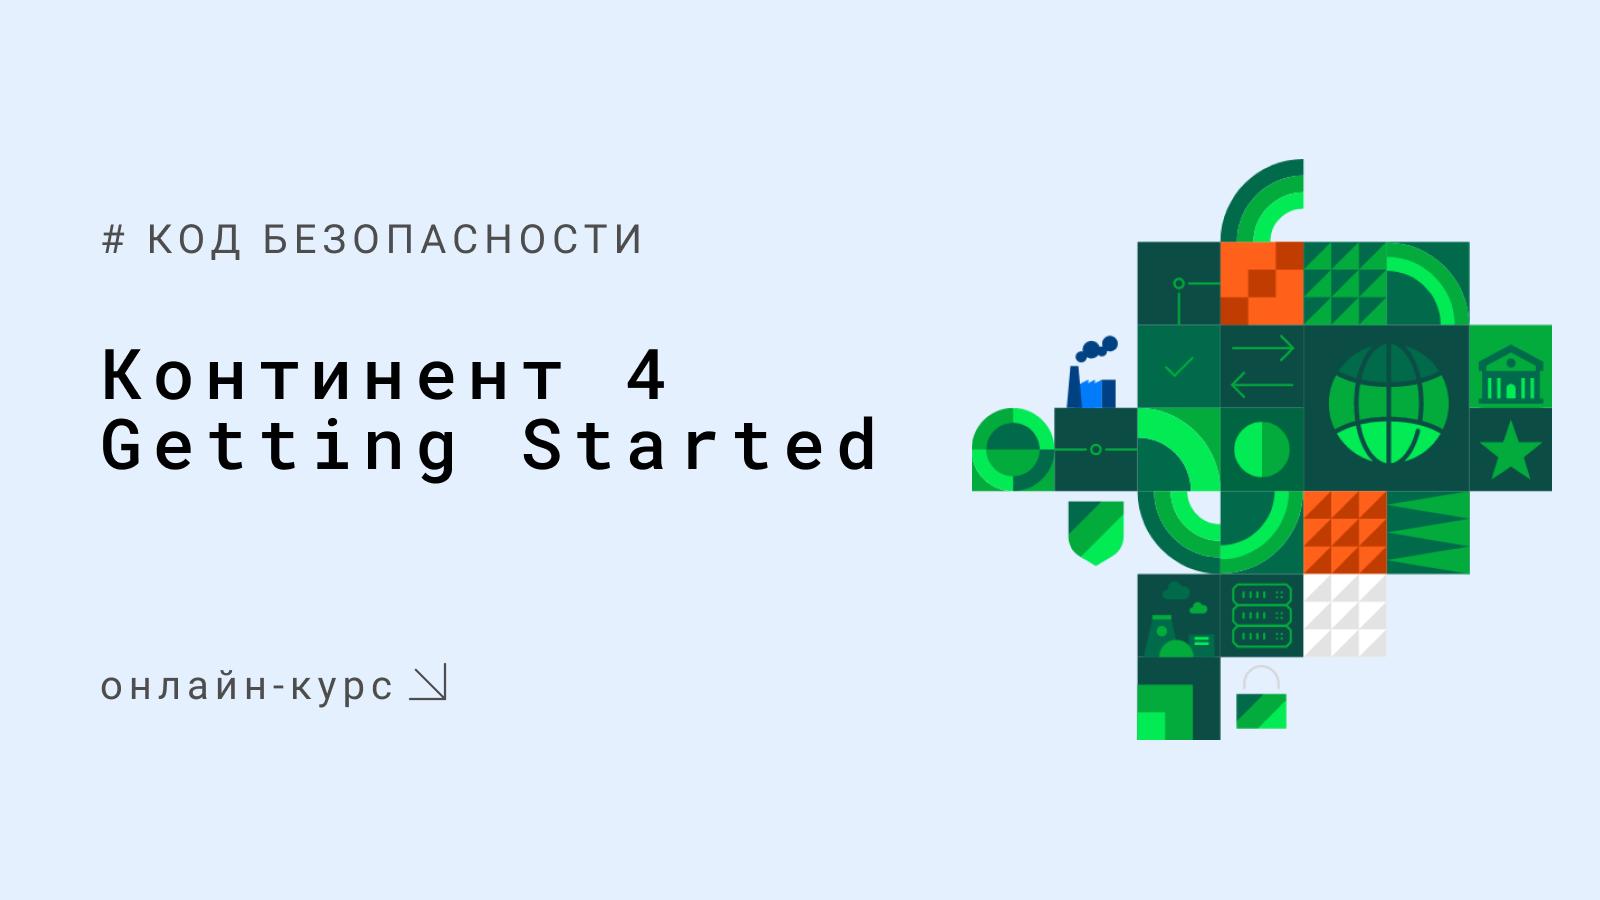 1. Континент 4 Getting Started. Введение